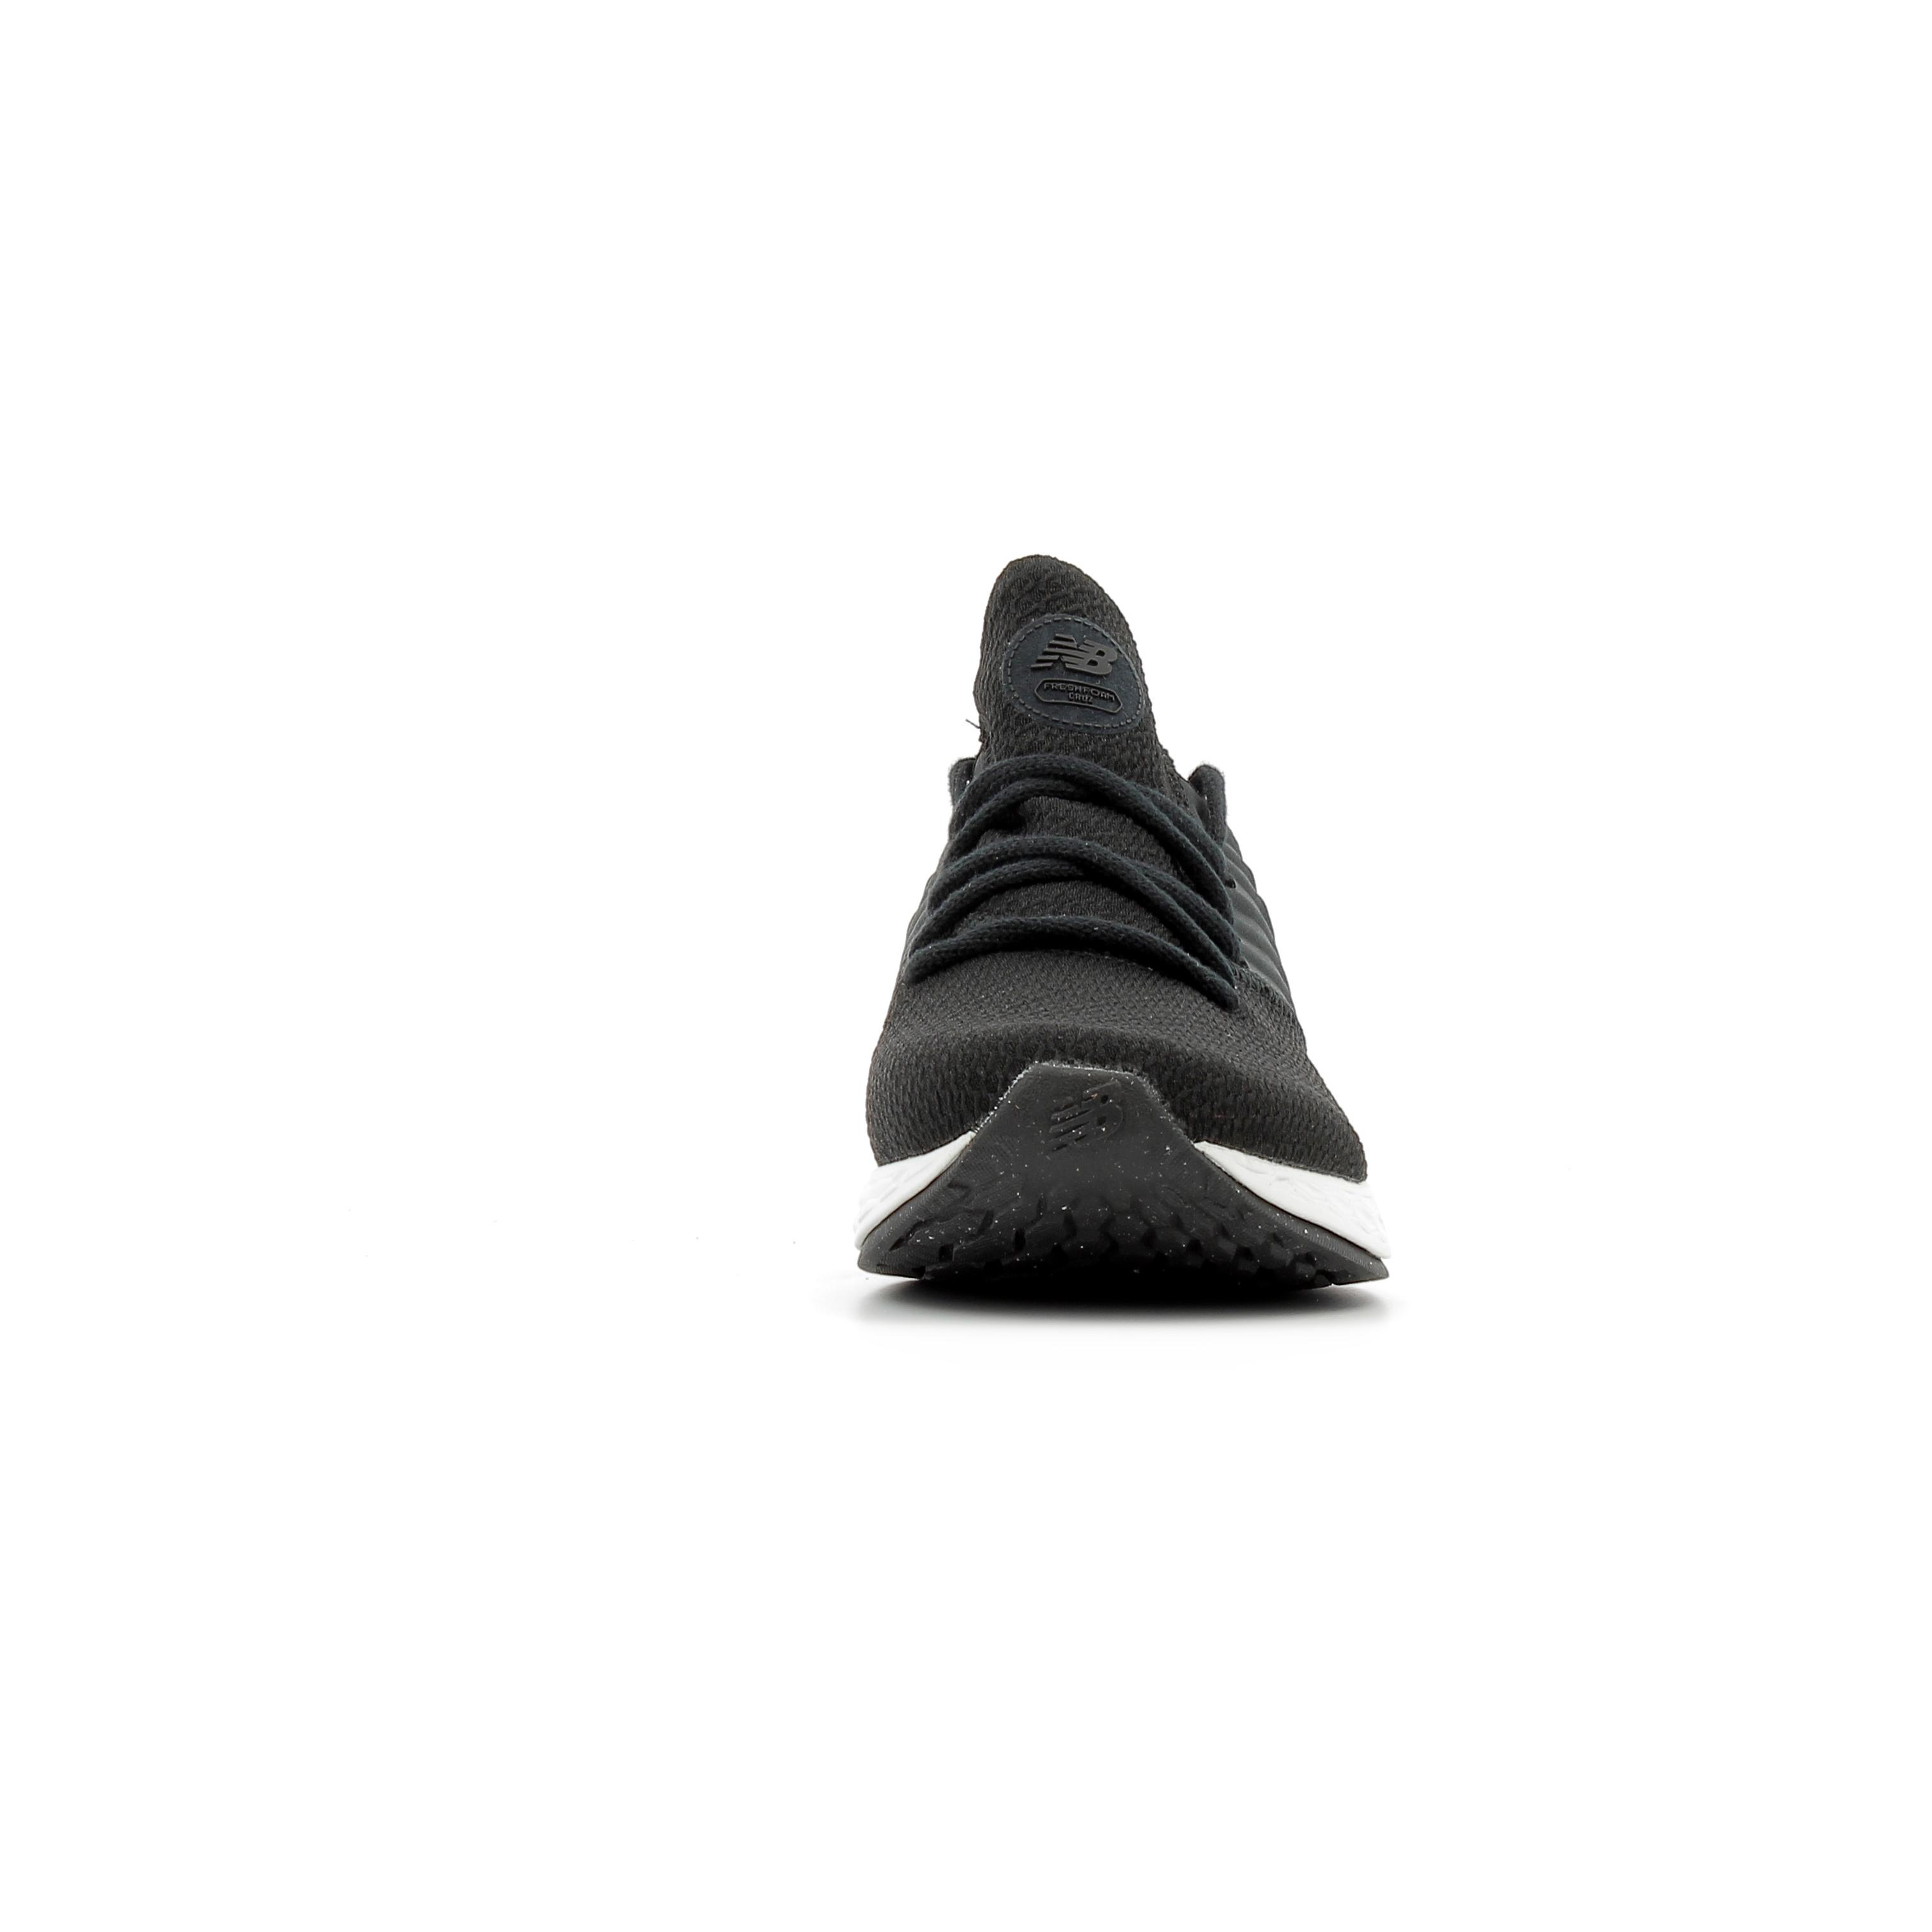 De Cruz Chaussures Women Balance Running Decon Fresh Foam New qMjLSUzVpG